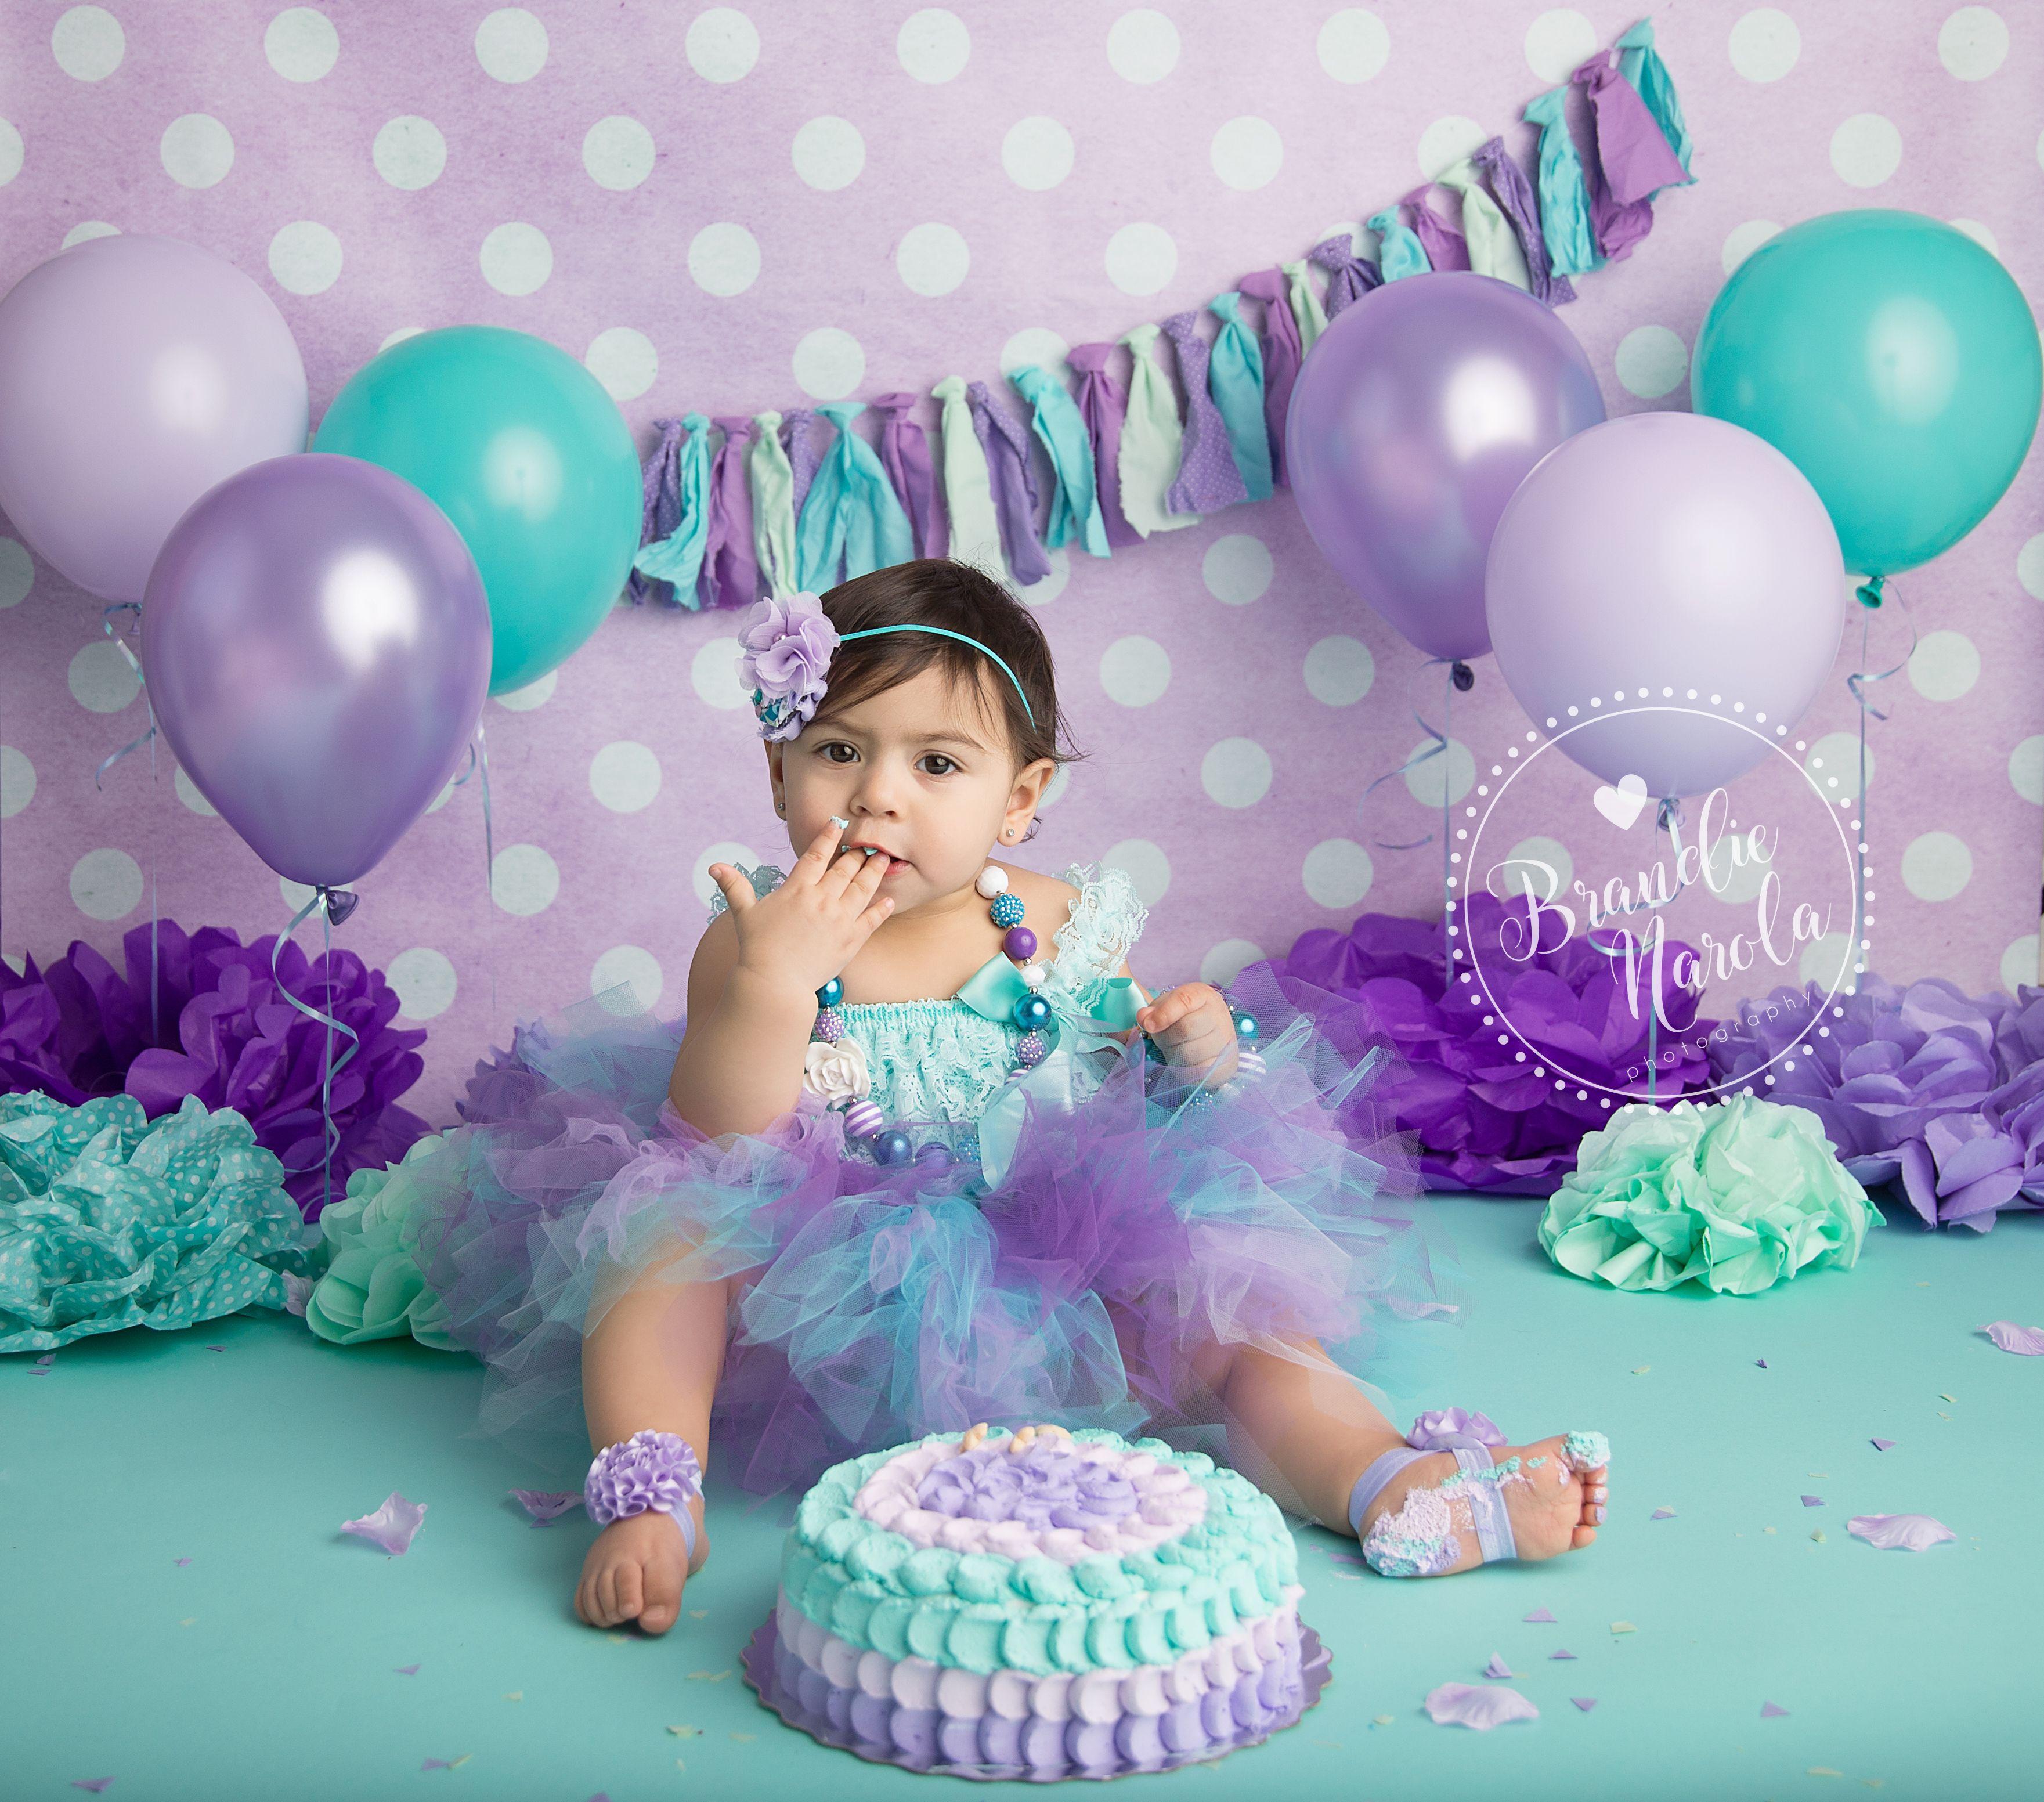 Cake Smash Purple And Aqua Cake Smash Girl Cake Smash